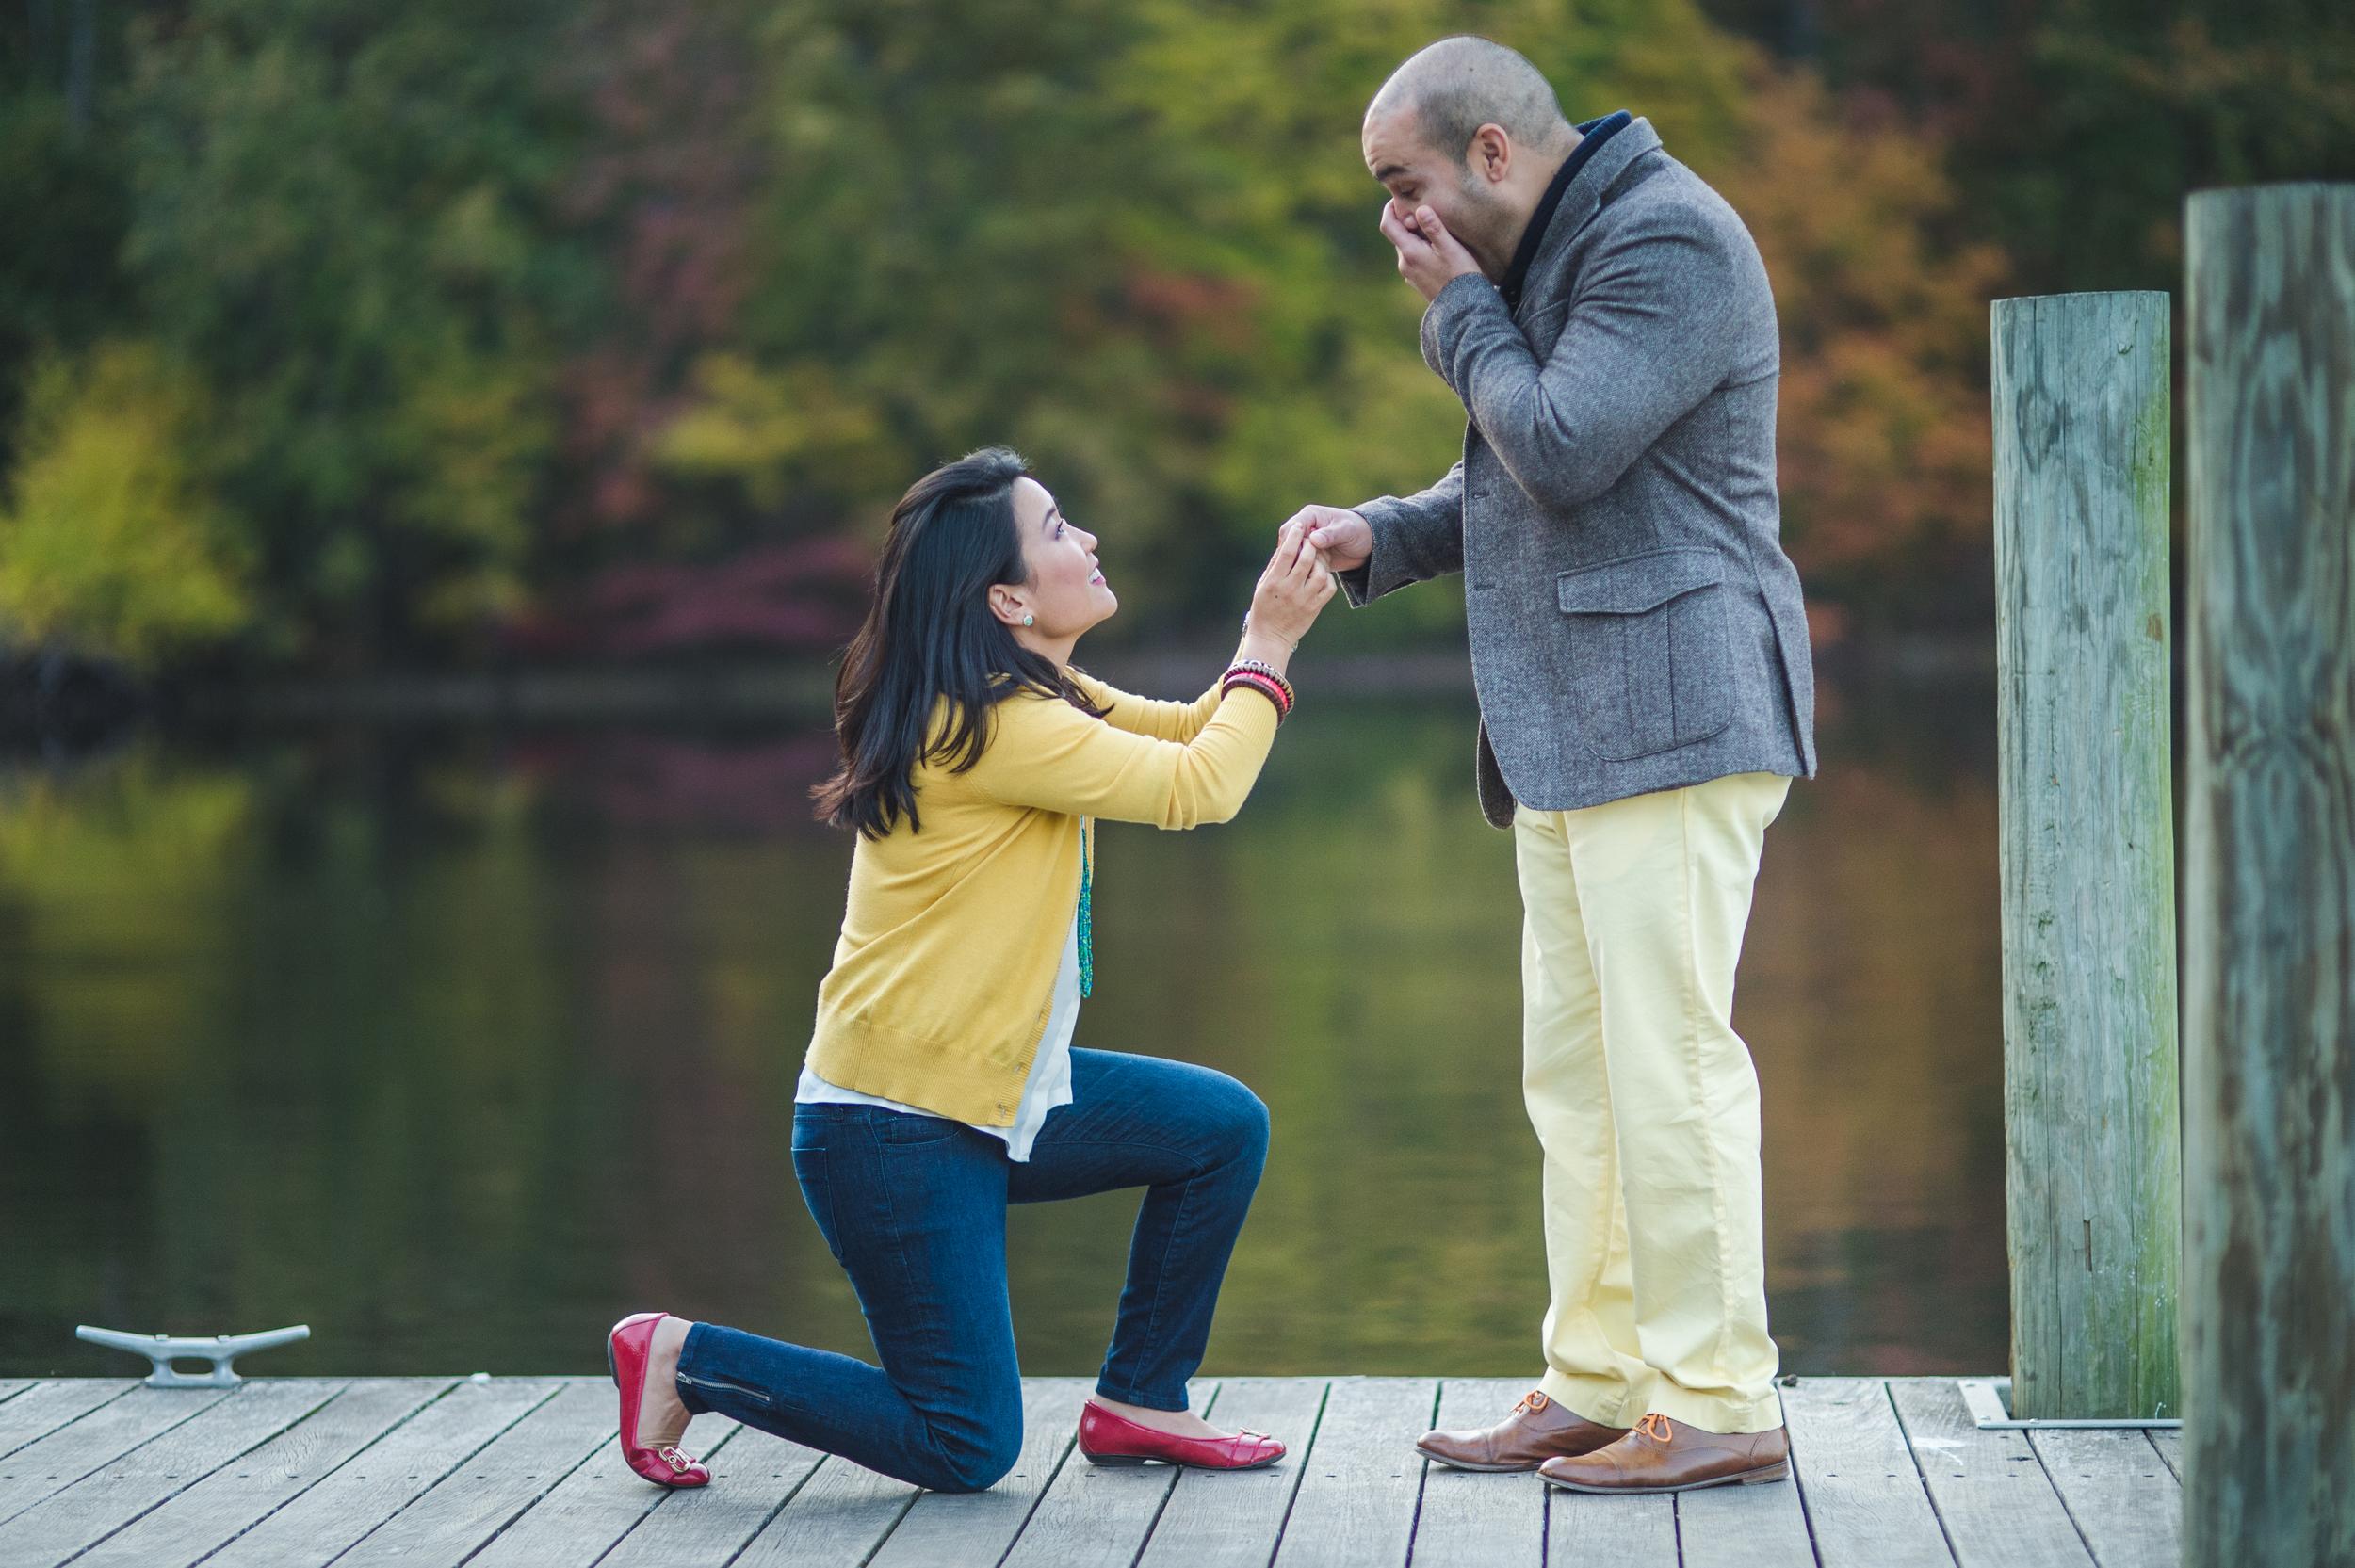 Fun Engagement session in Baltimore MD By Mantas Kubilinskas-7.jpg